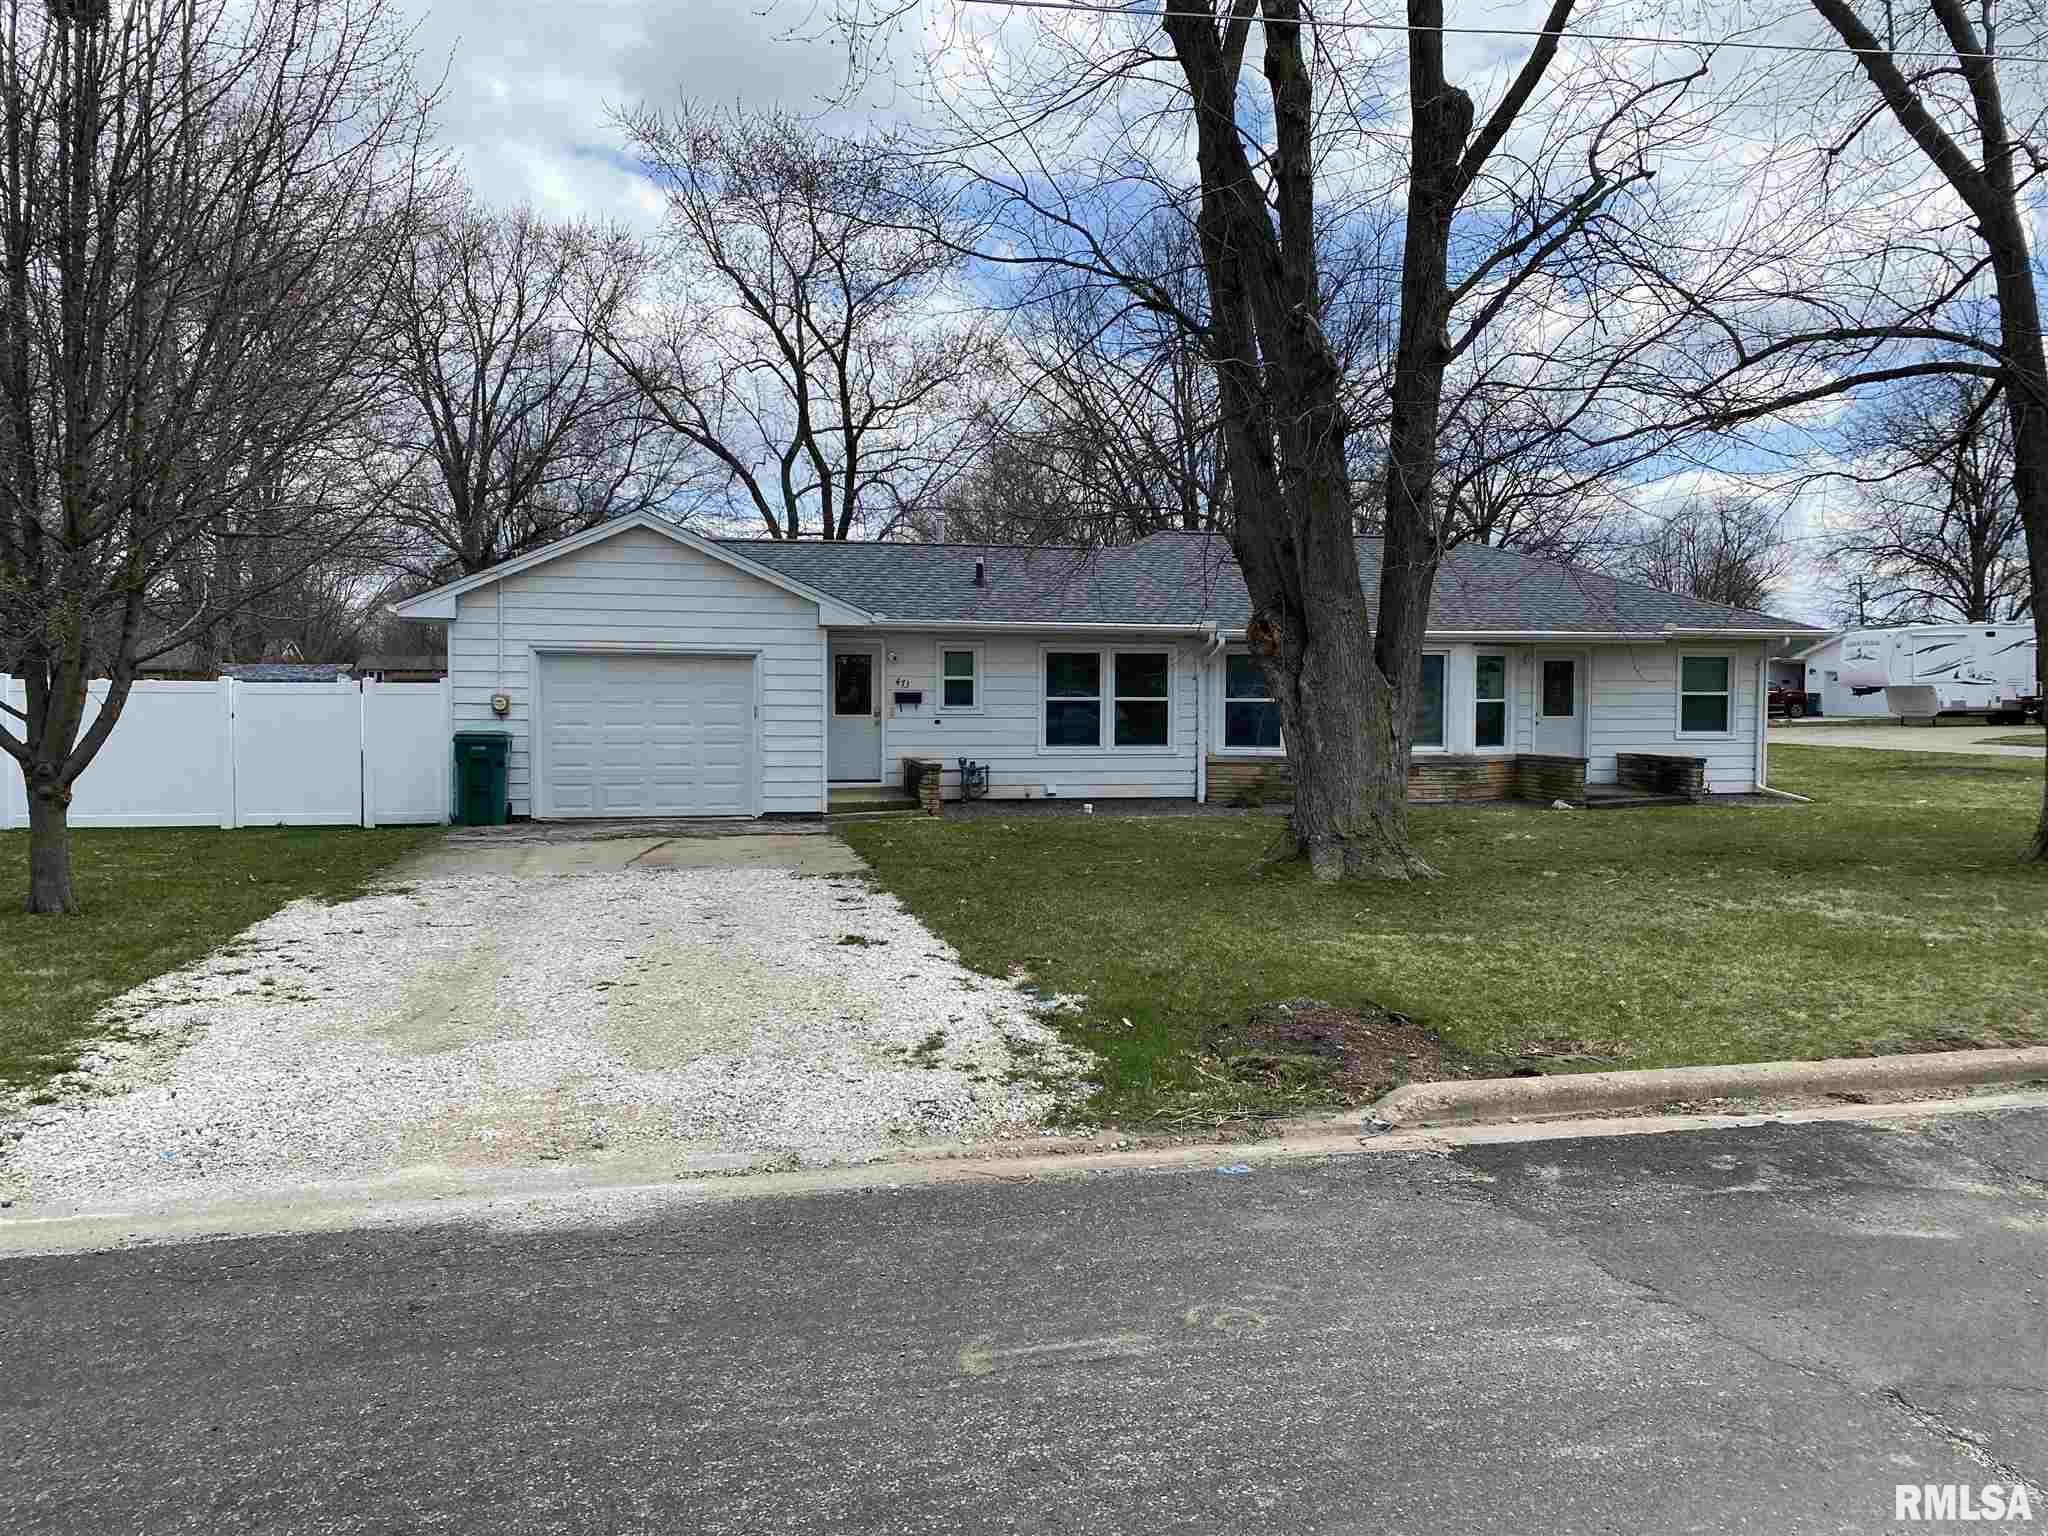 473 S APPLE Property Photo - Farmington, IL real estate listing